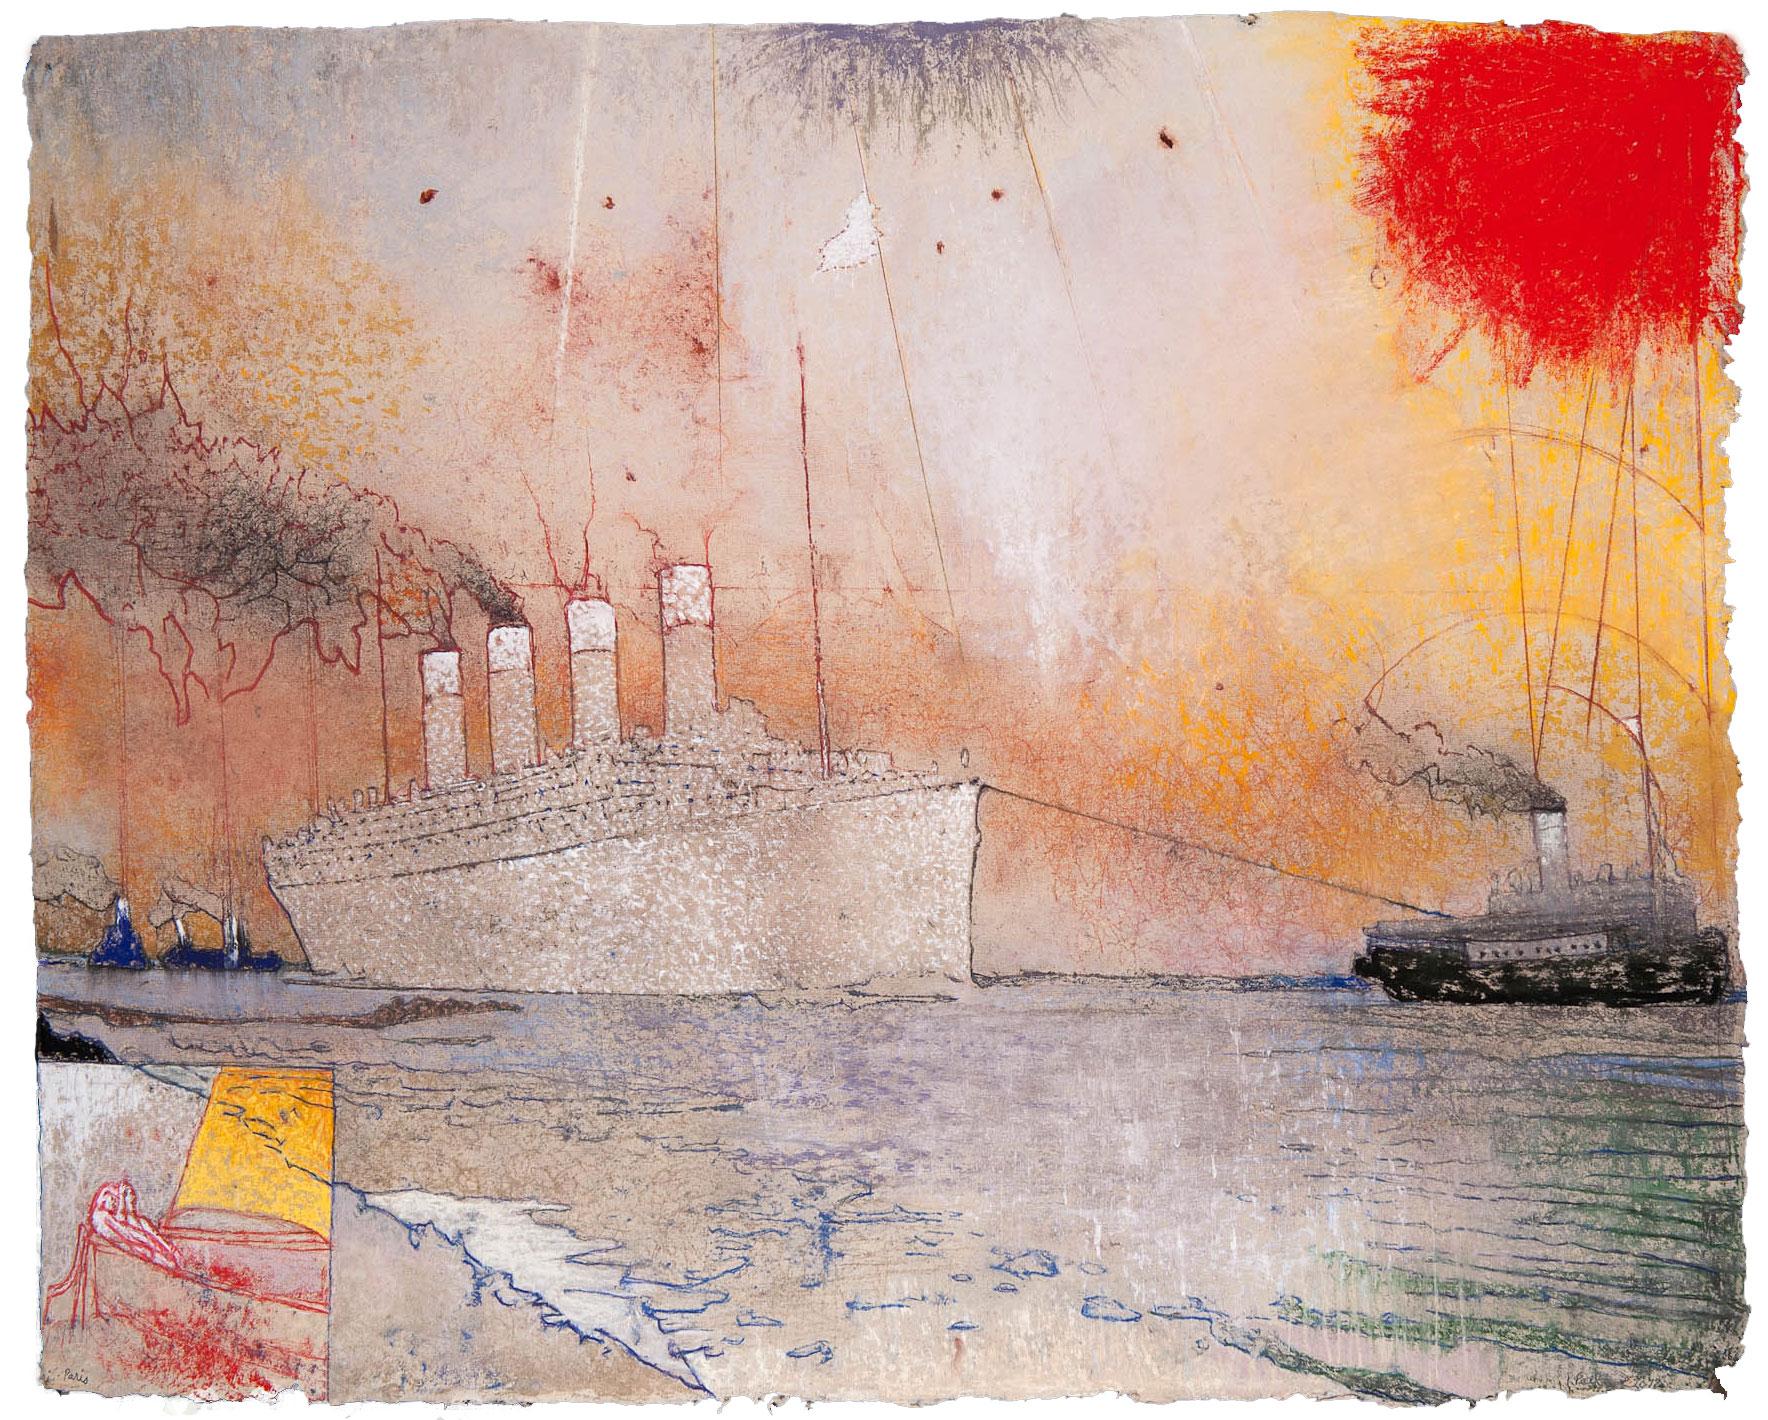 Irving Petlin's Armada of Discontent - December 3, 2017 | Hyperallergic | John Yau